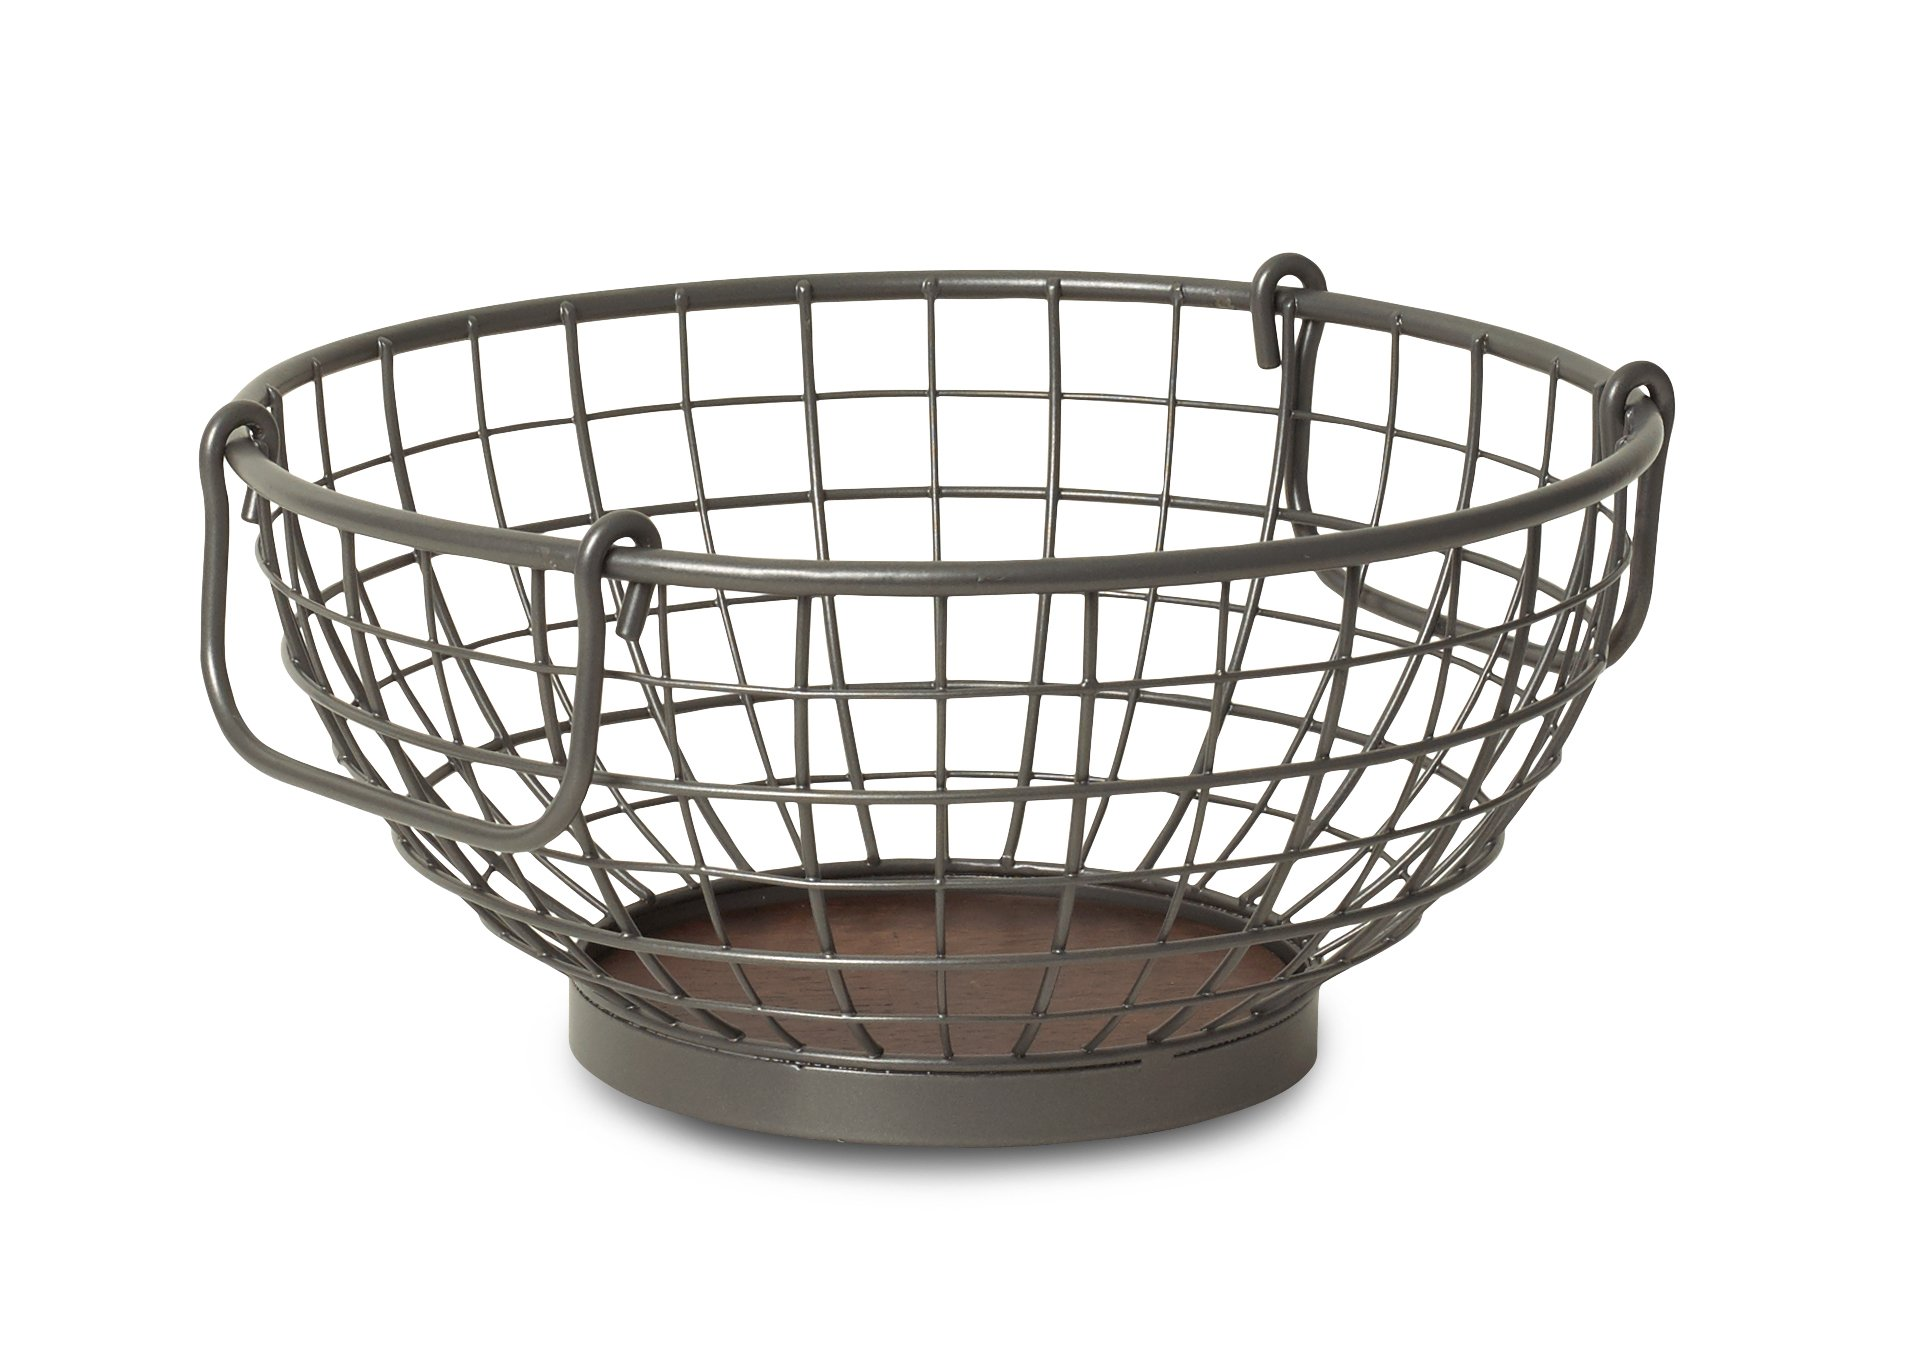 Spectrum Diversified Vintage Fruit Bowl, Industrial Gray by Spectrum Diversified